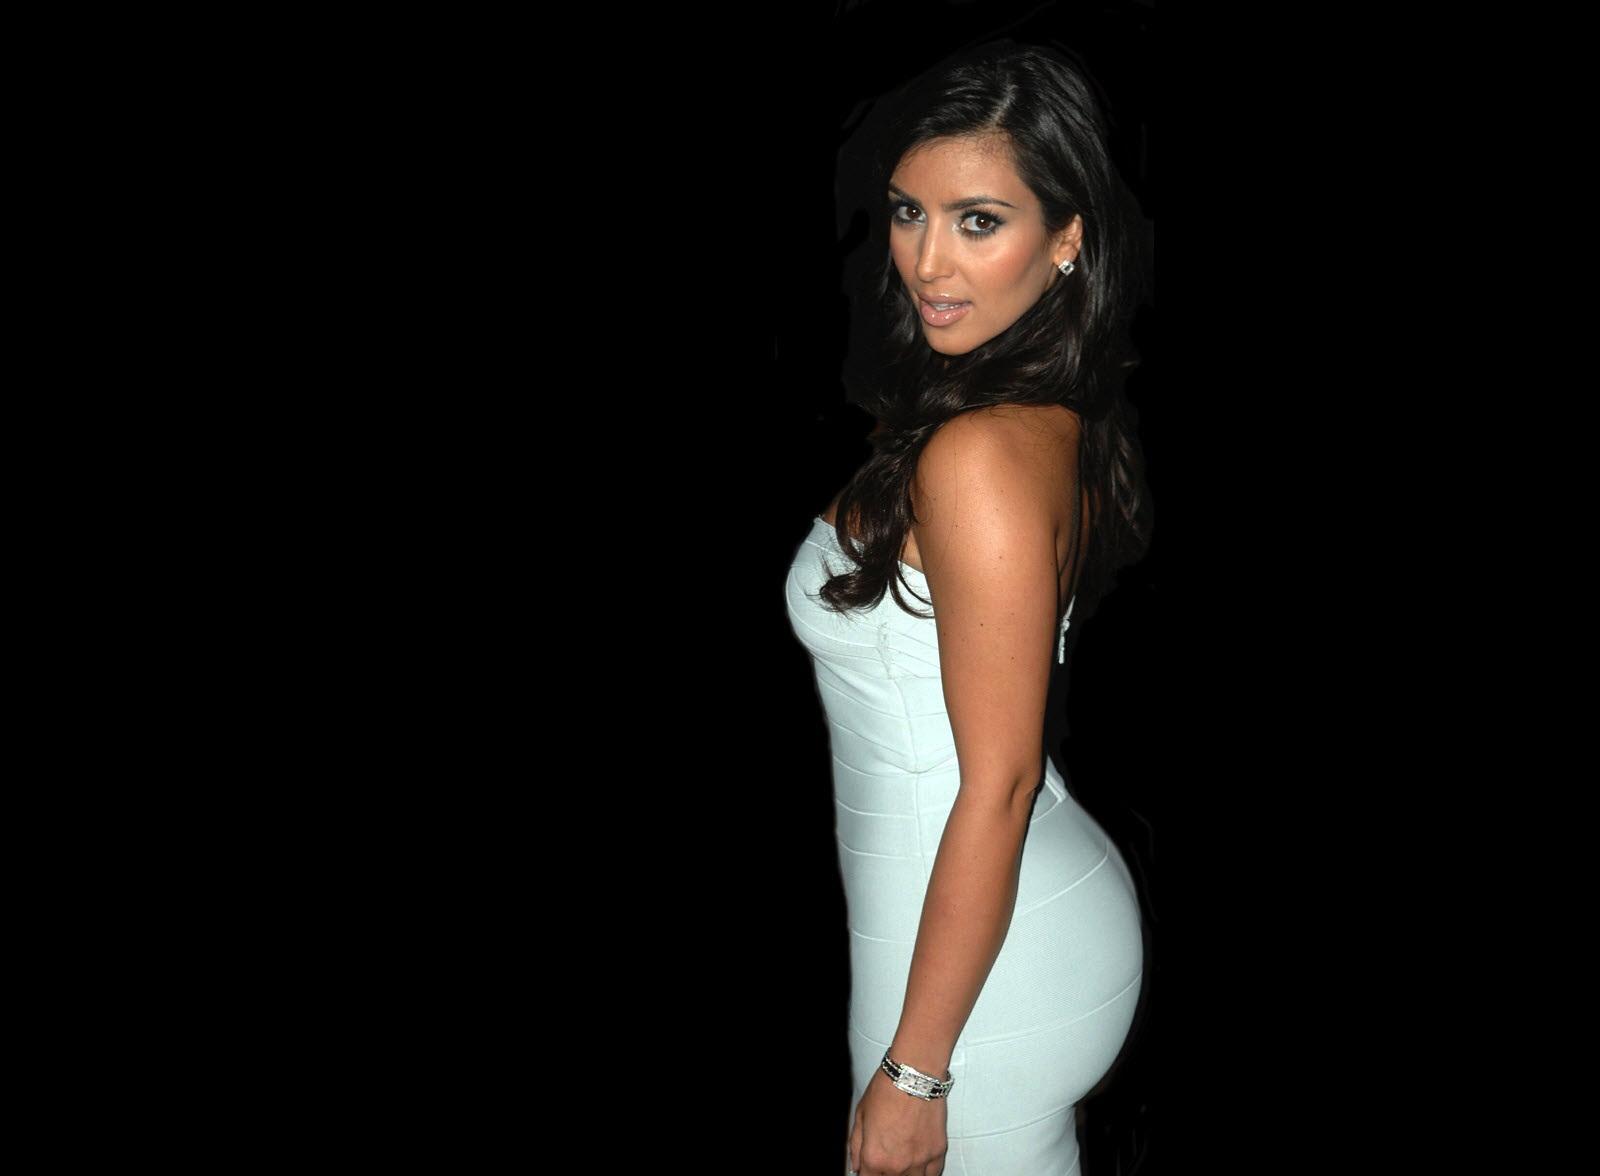 Kim Kardashian HD Wallpapers Global Celebrities Blog 1600x1176